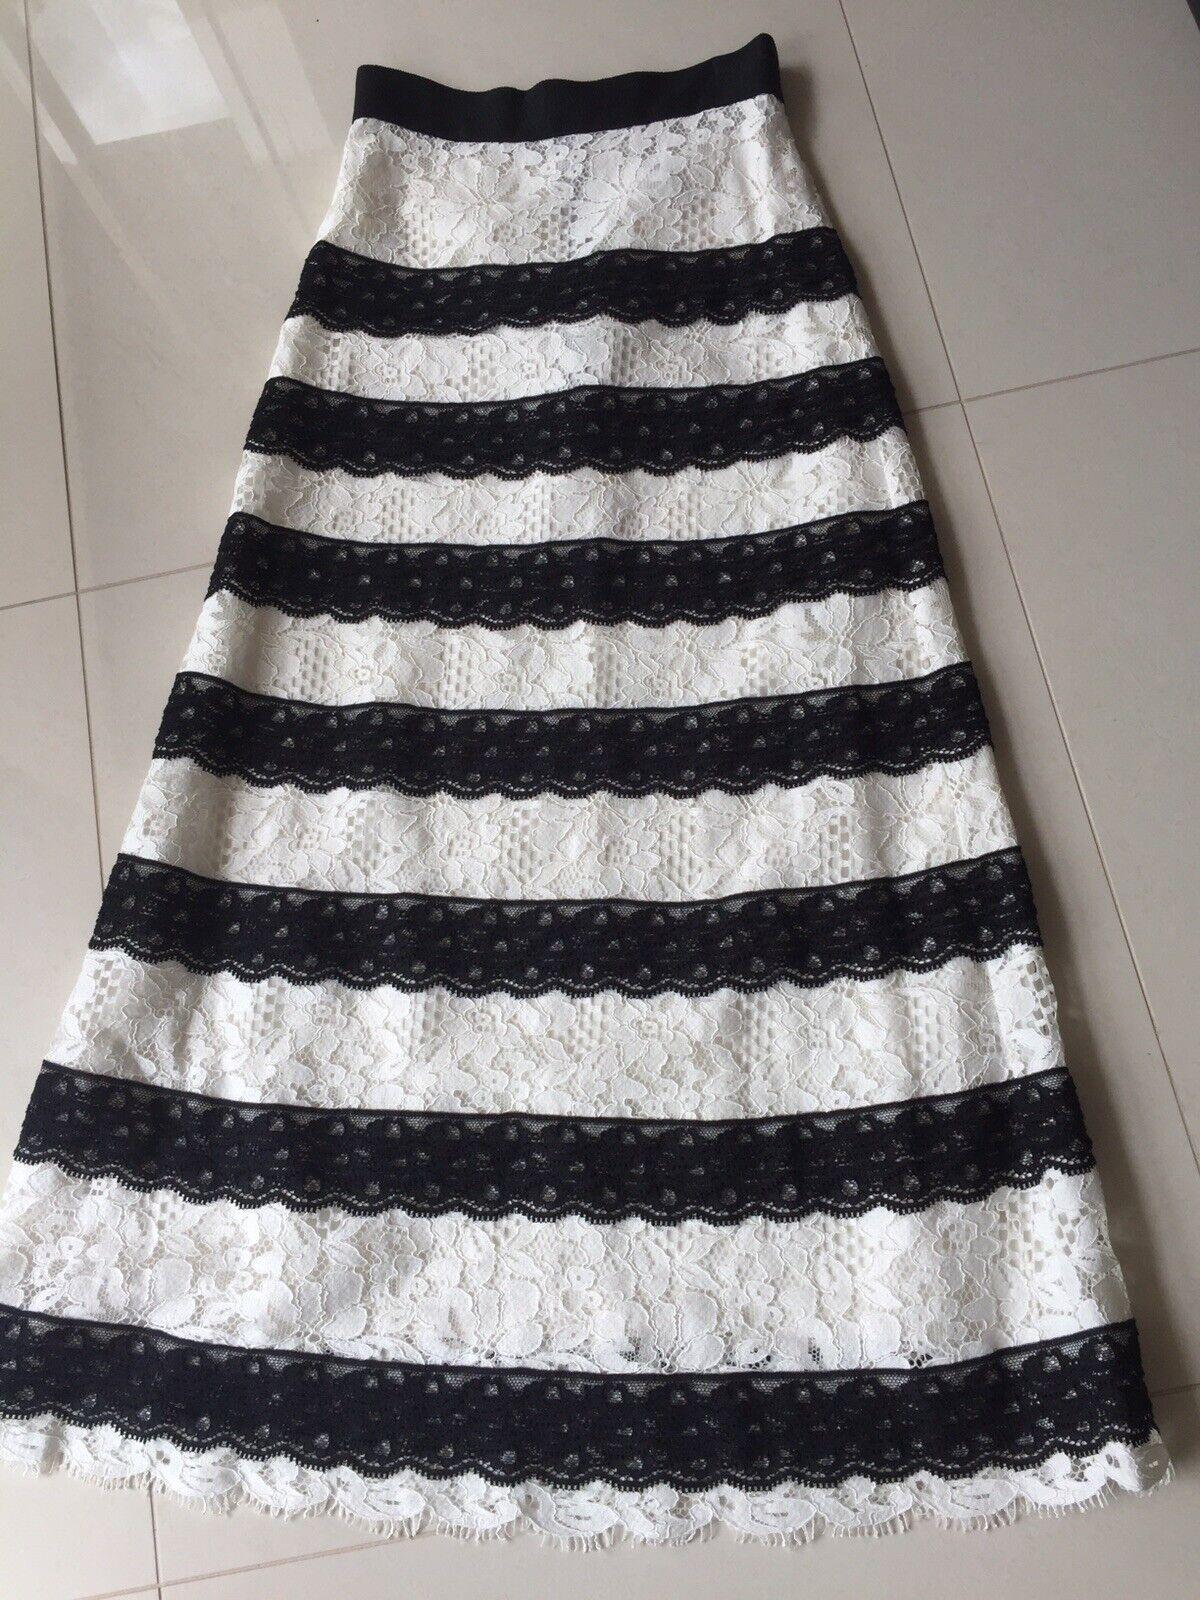 Vilshenko Lace  Skirt  Size 6 Fits 6-8 Aau Ask About Measurements RRP   1890